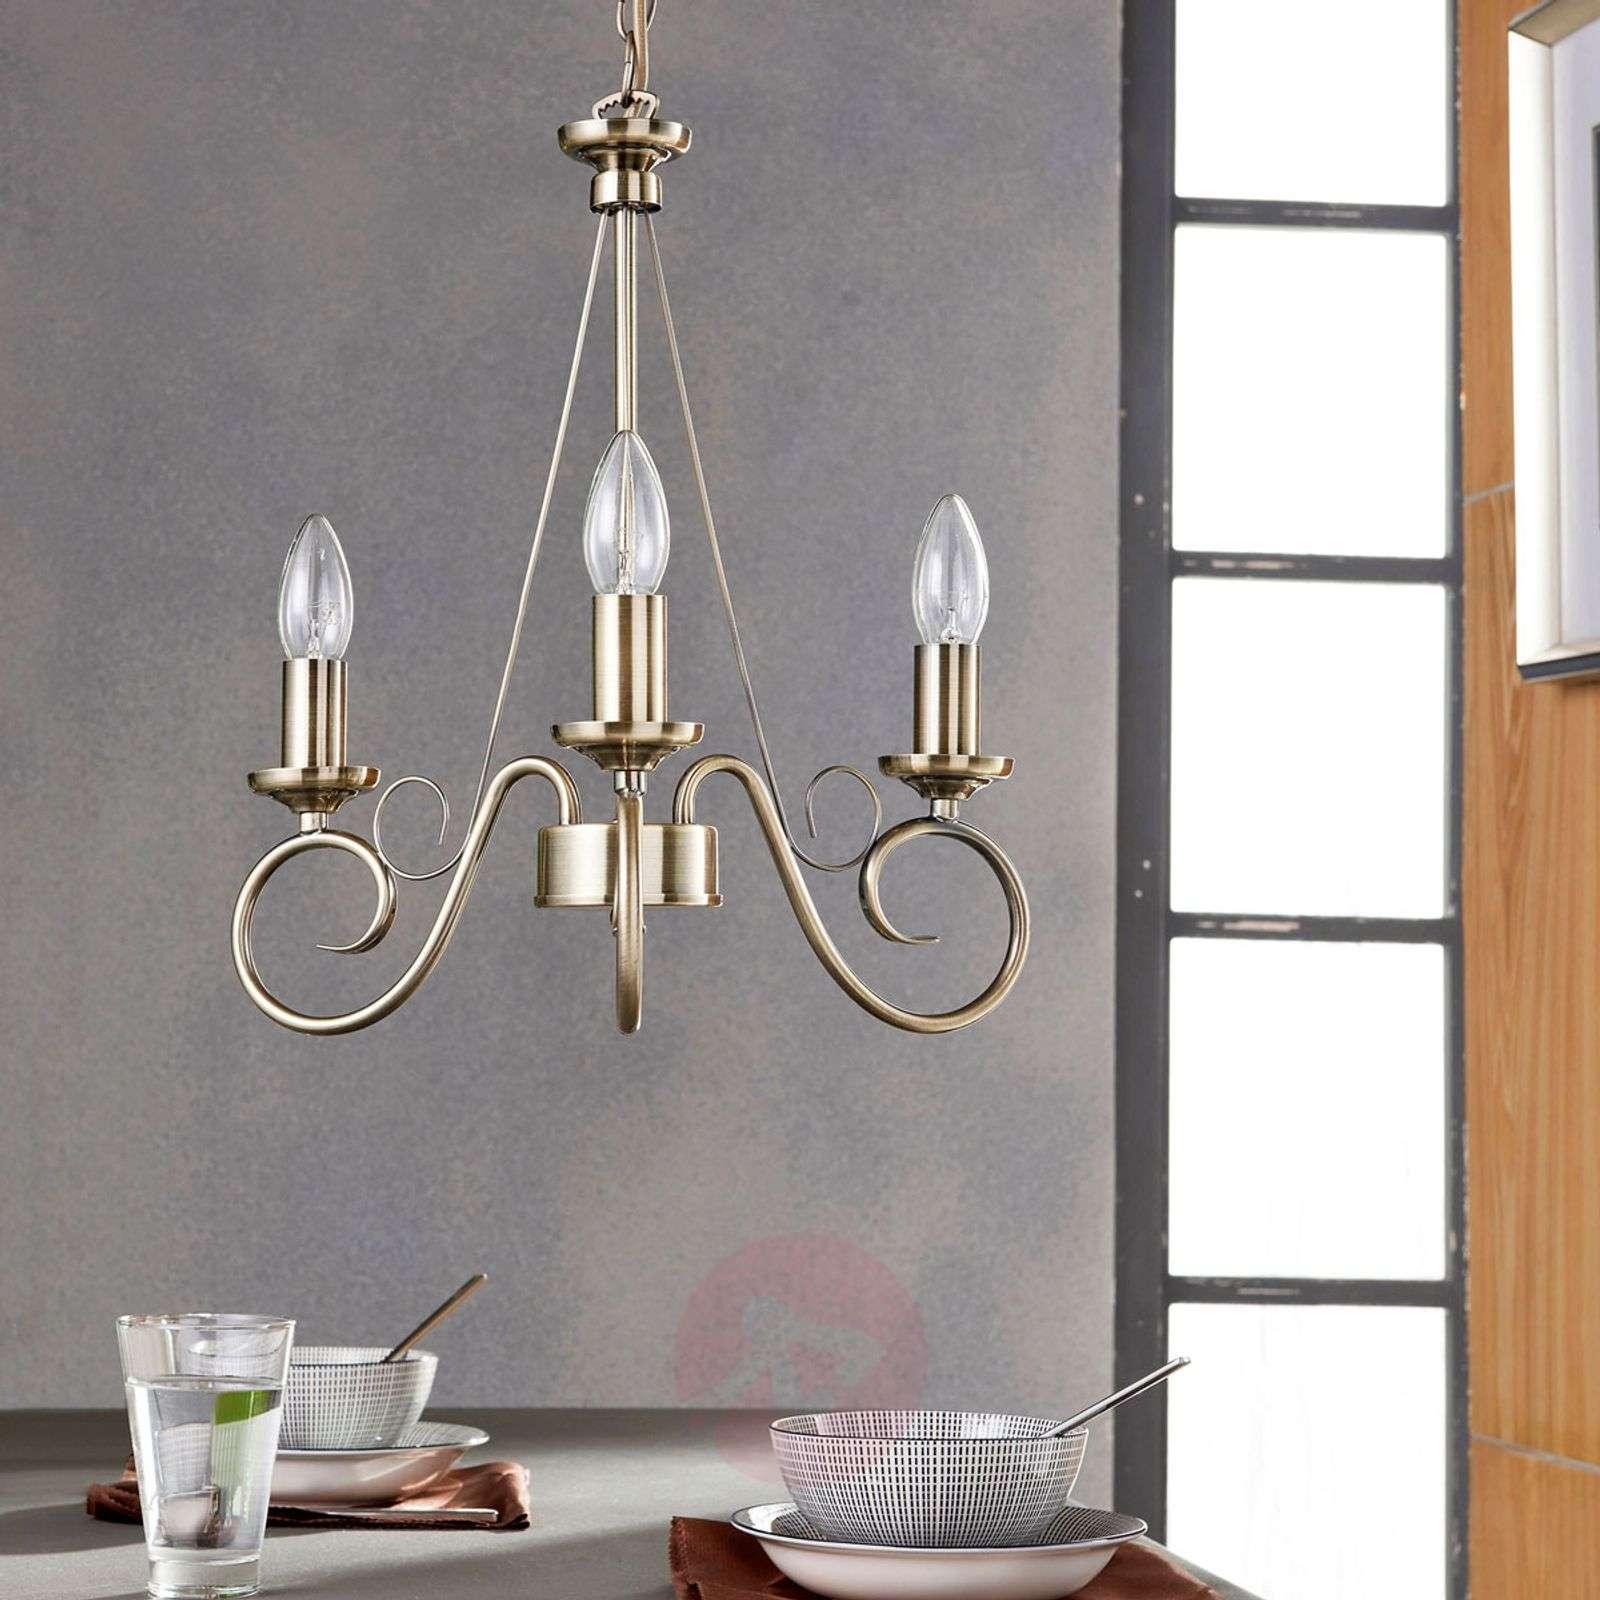 Antique brass chandelier Marnia, 3-bulb-9621014-01